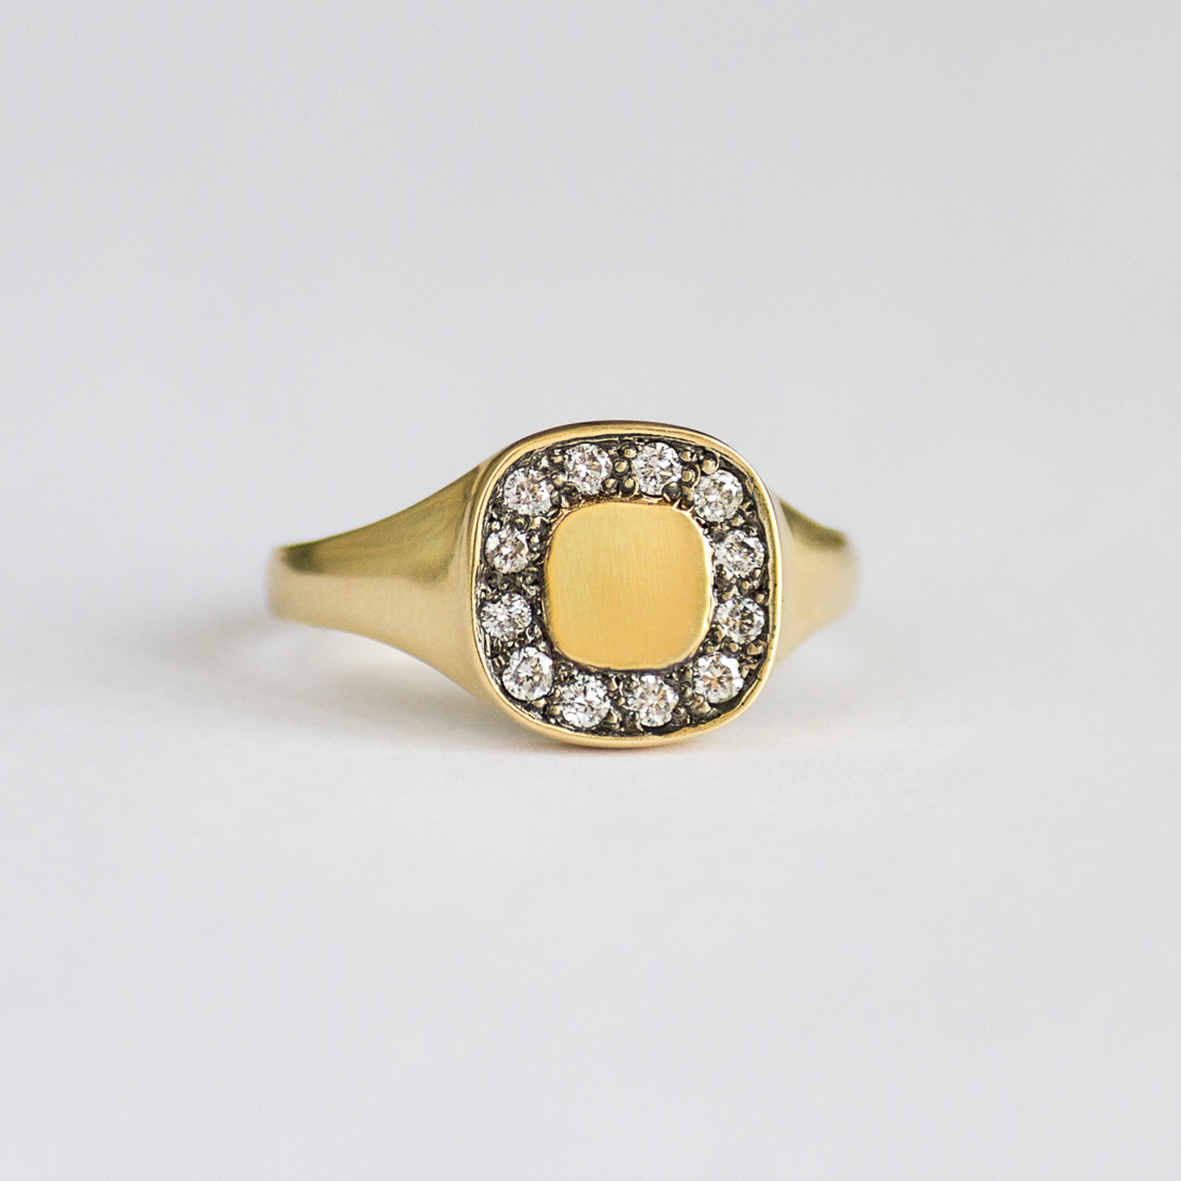 2. OONA_lotus_ficha1_signet square diamond ring